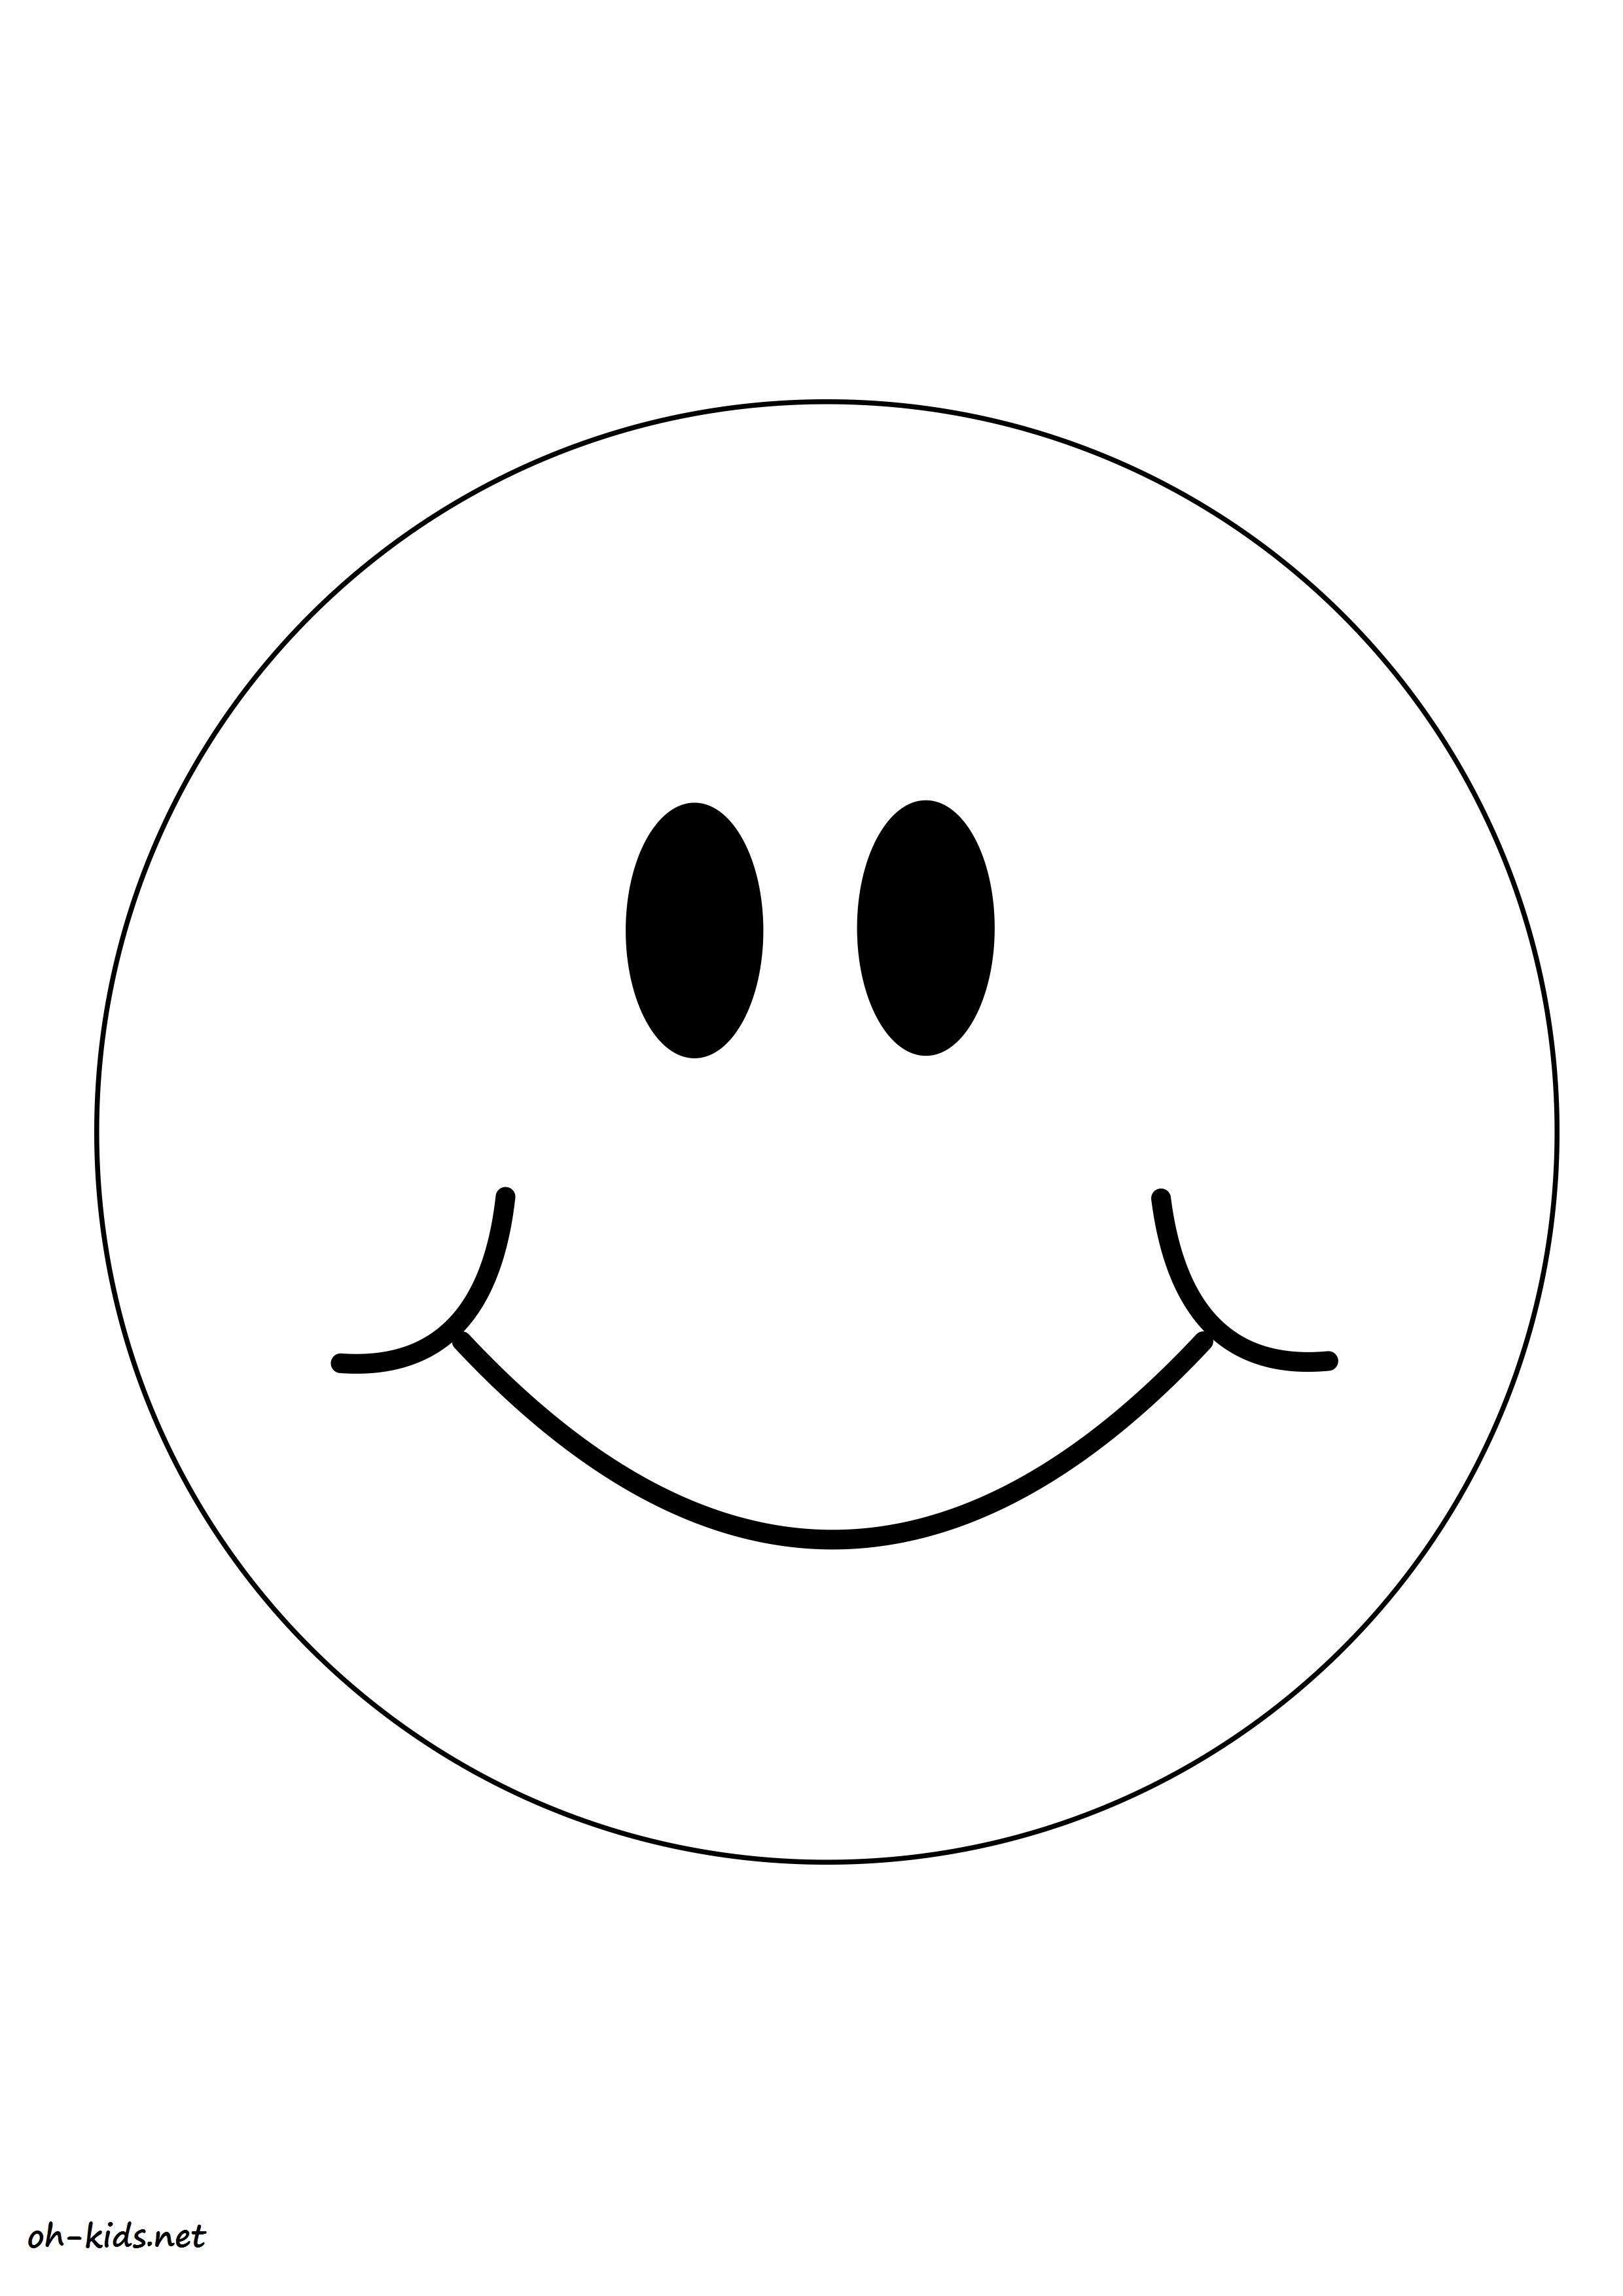 Dessin 754 Coloriage Smiley A Imprimer Oh Kids Net